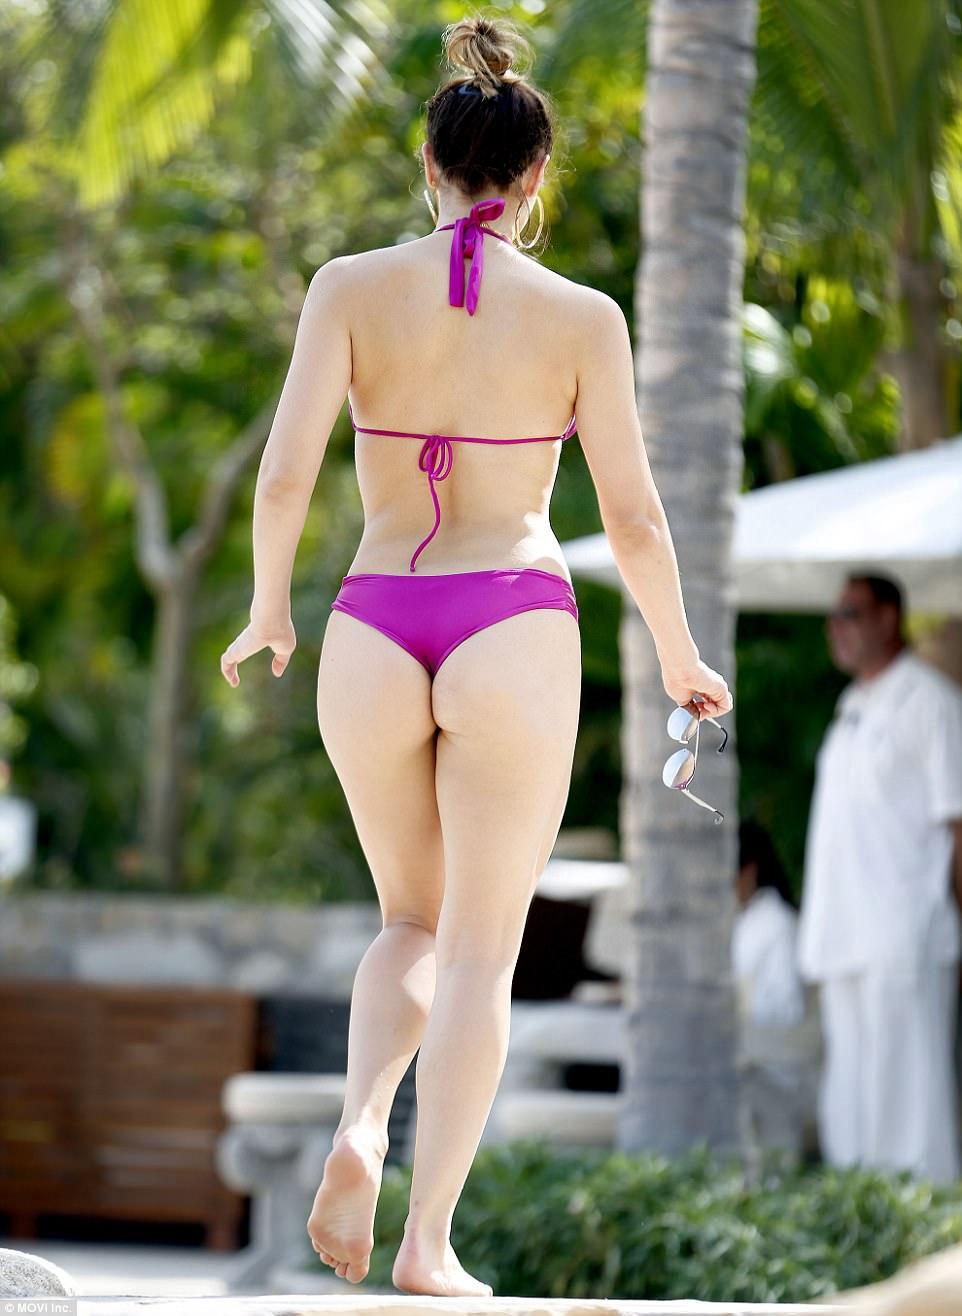 Eva longoria nipple short 6